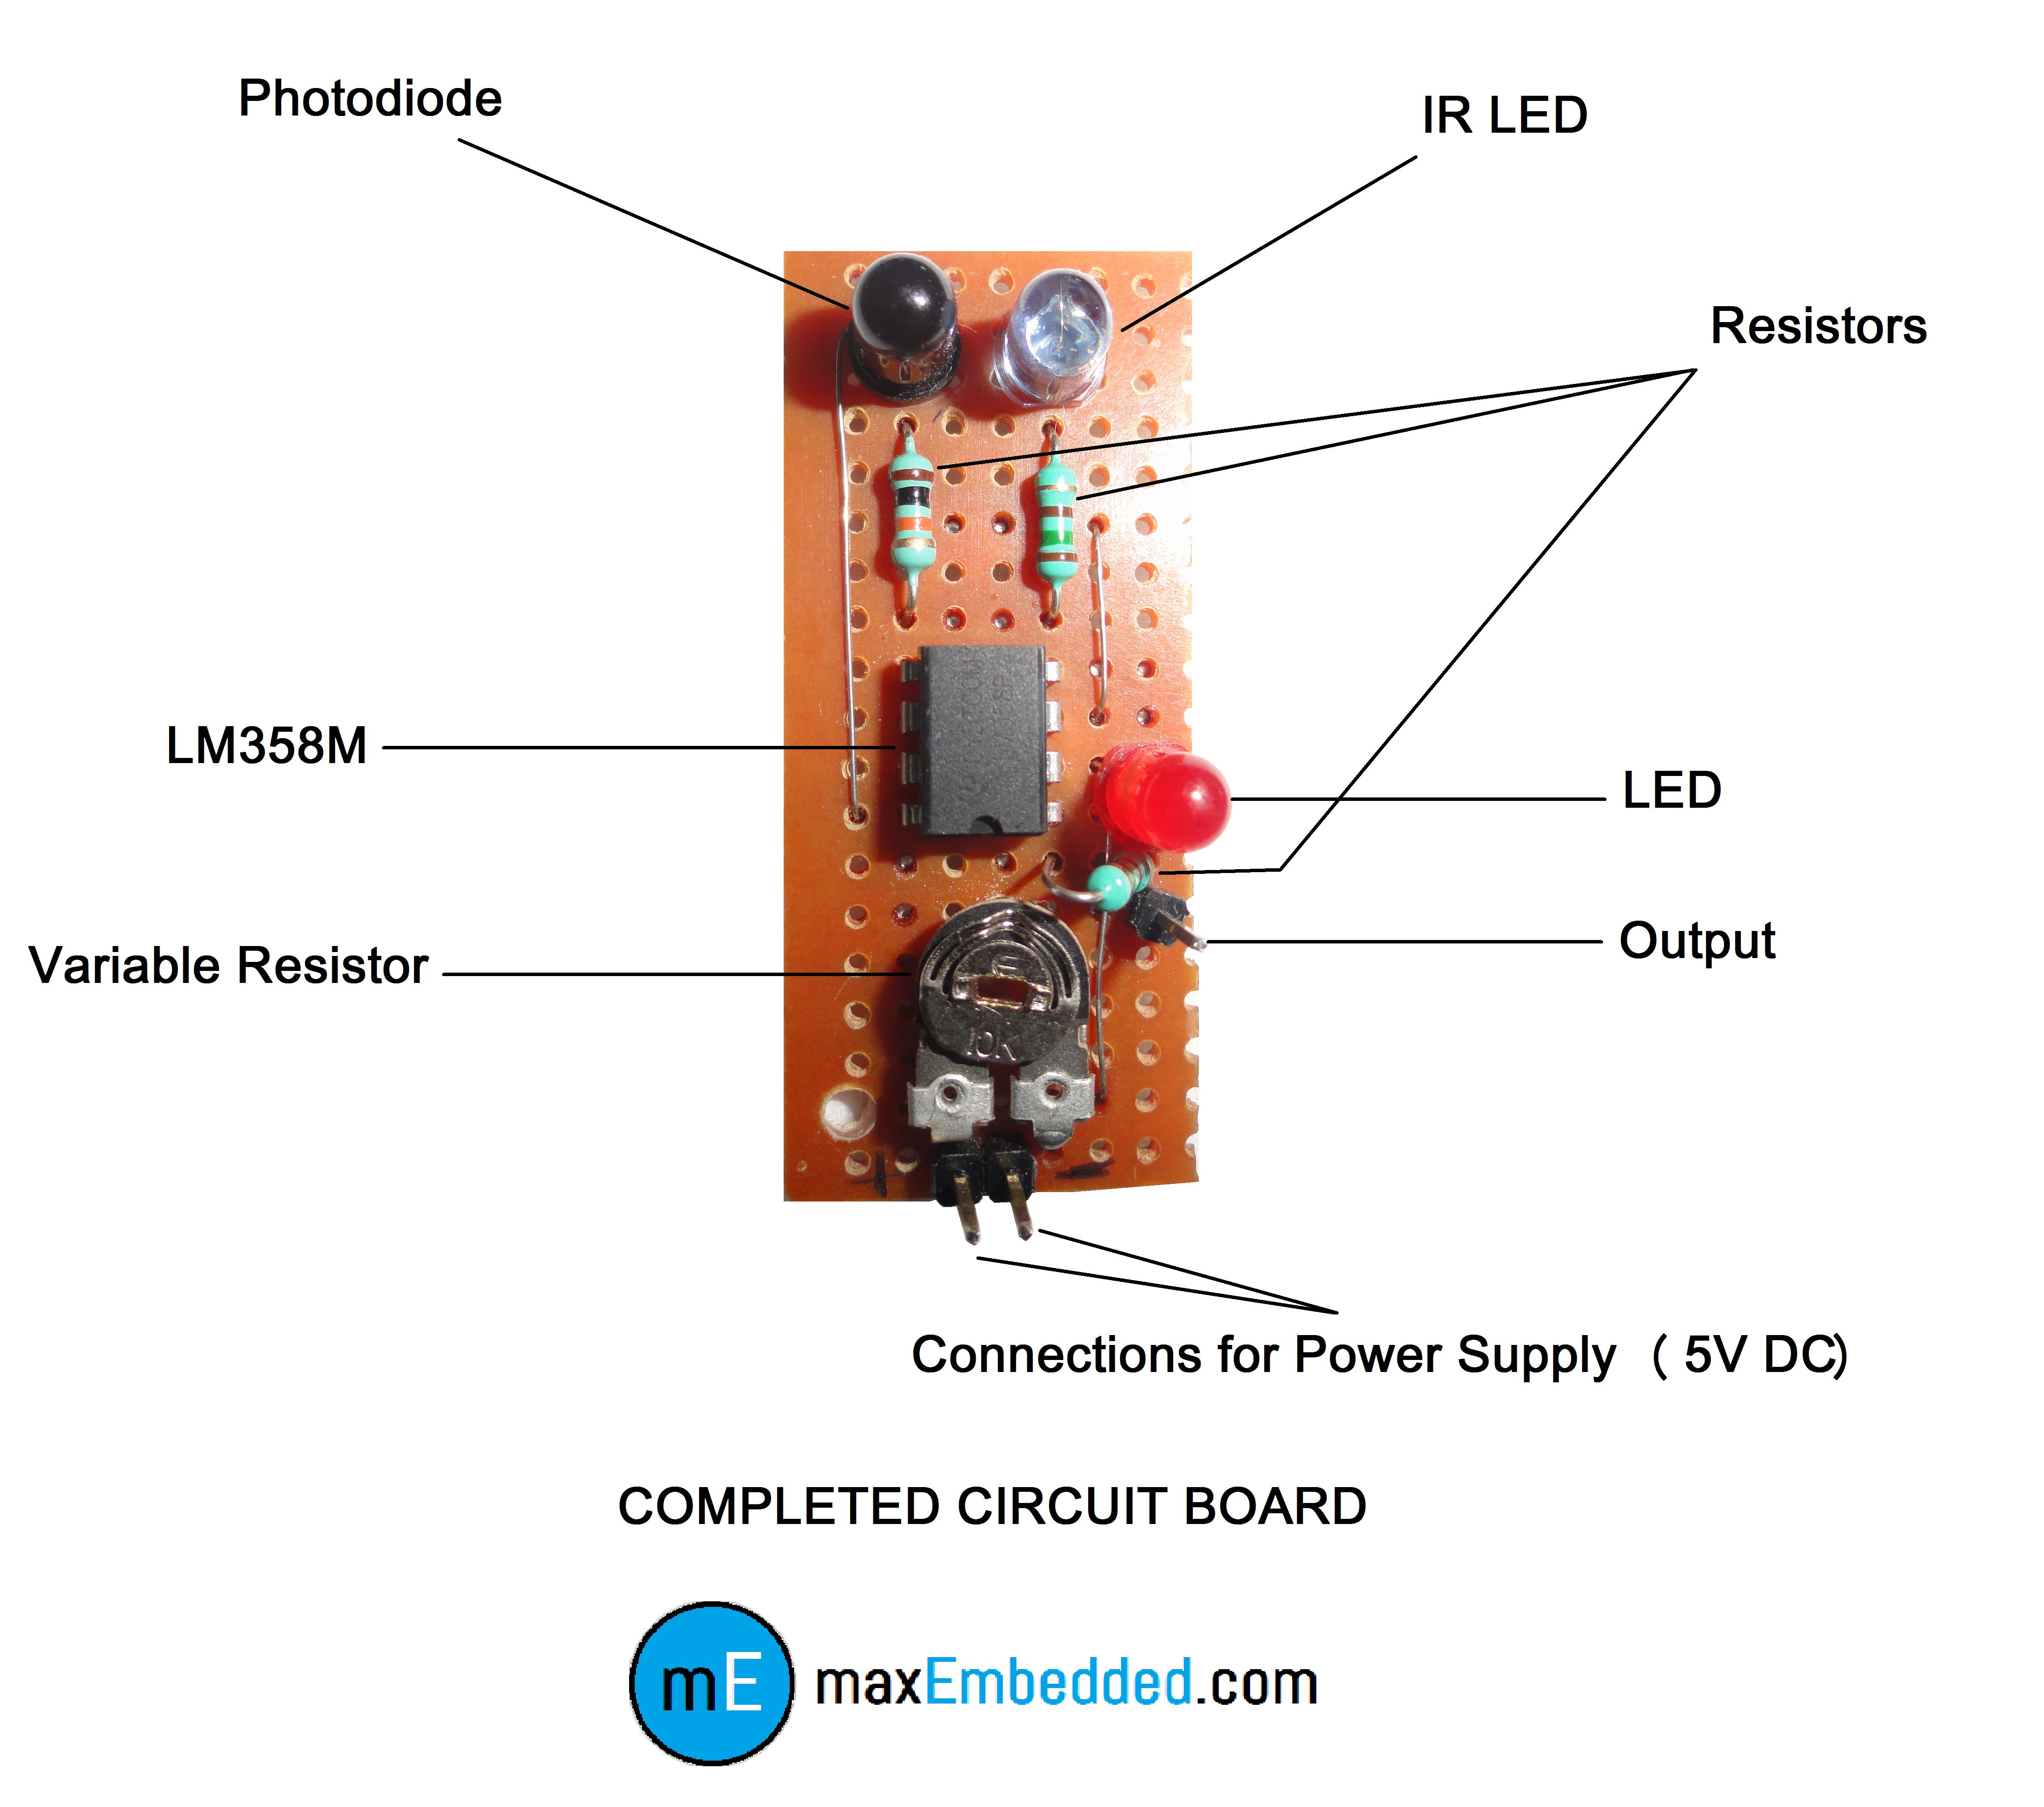 Ir Proximity Sensor Circuit Diagram Human Detect X3cbx3ecircuitx3c Infrared Based Circuits